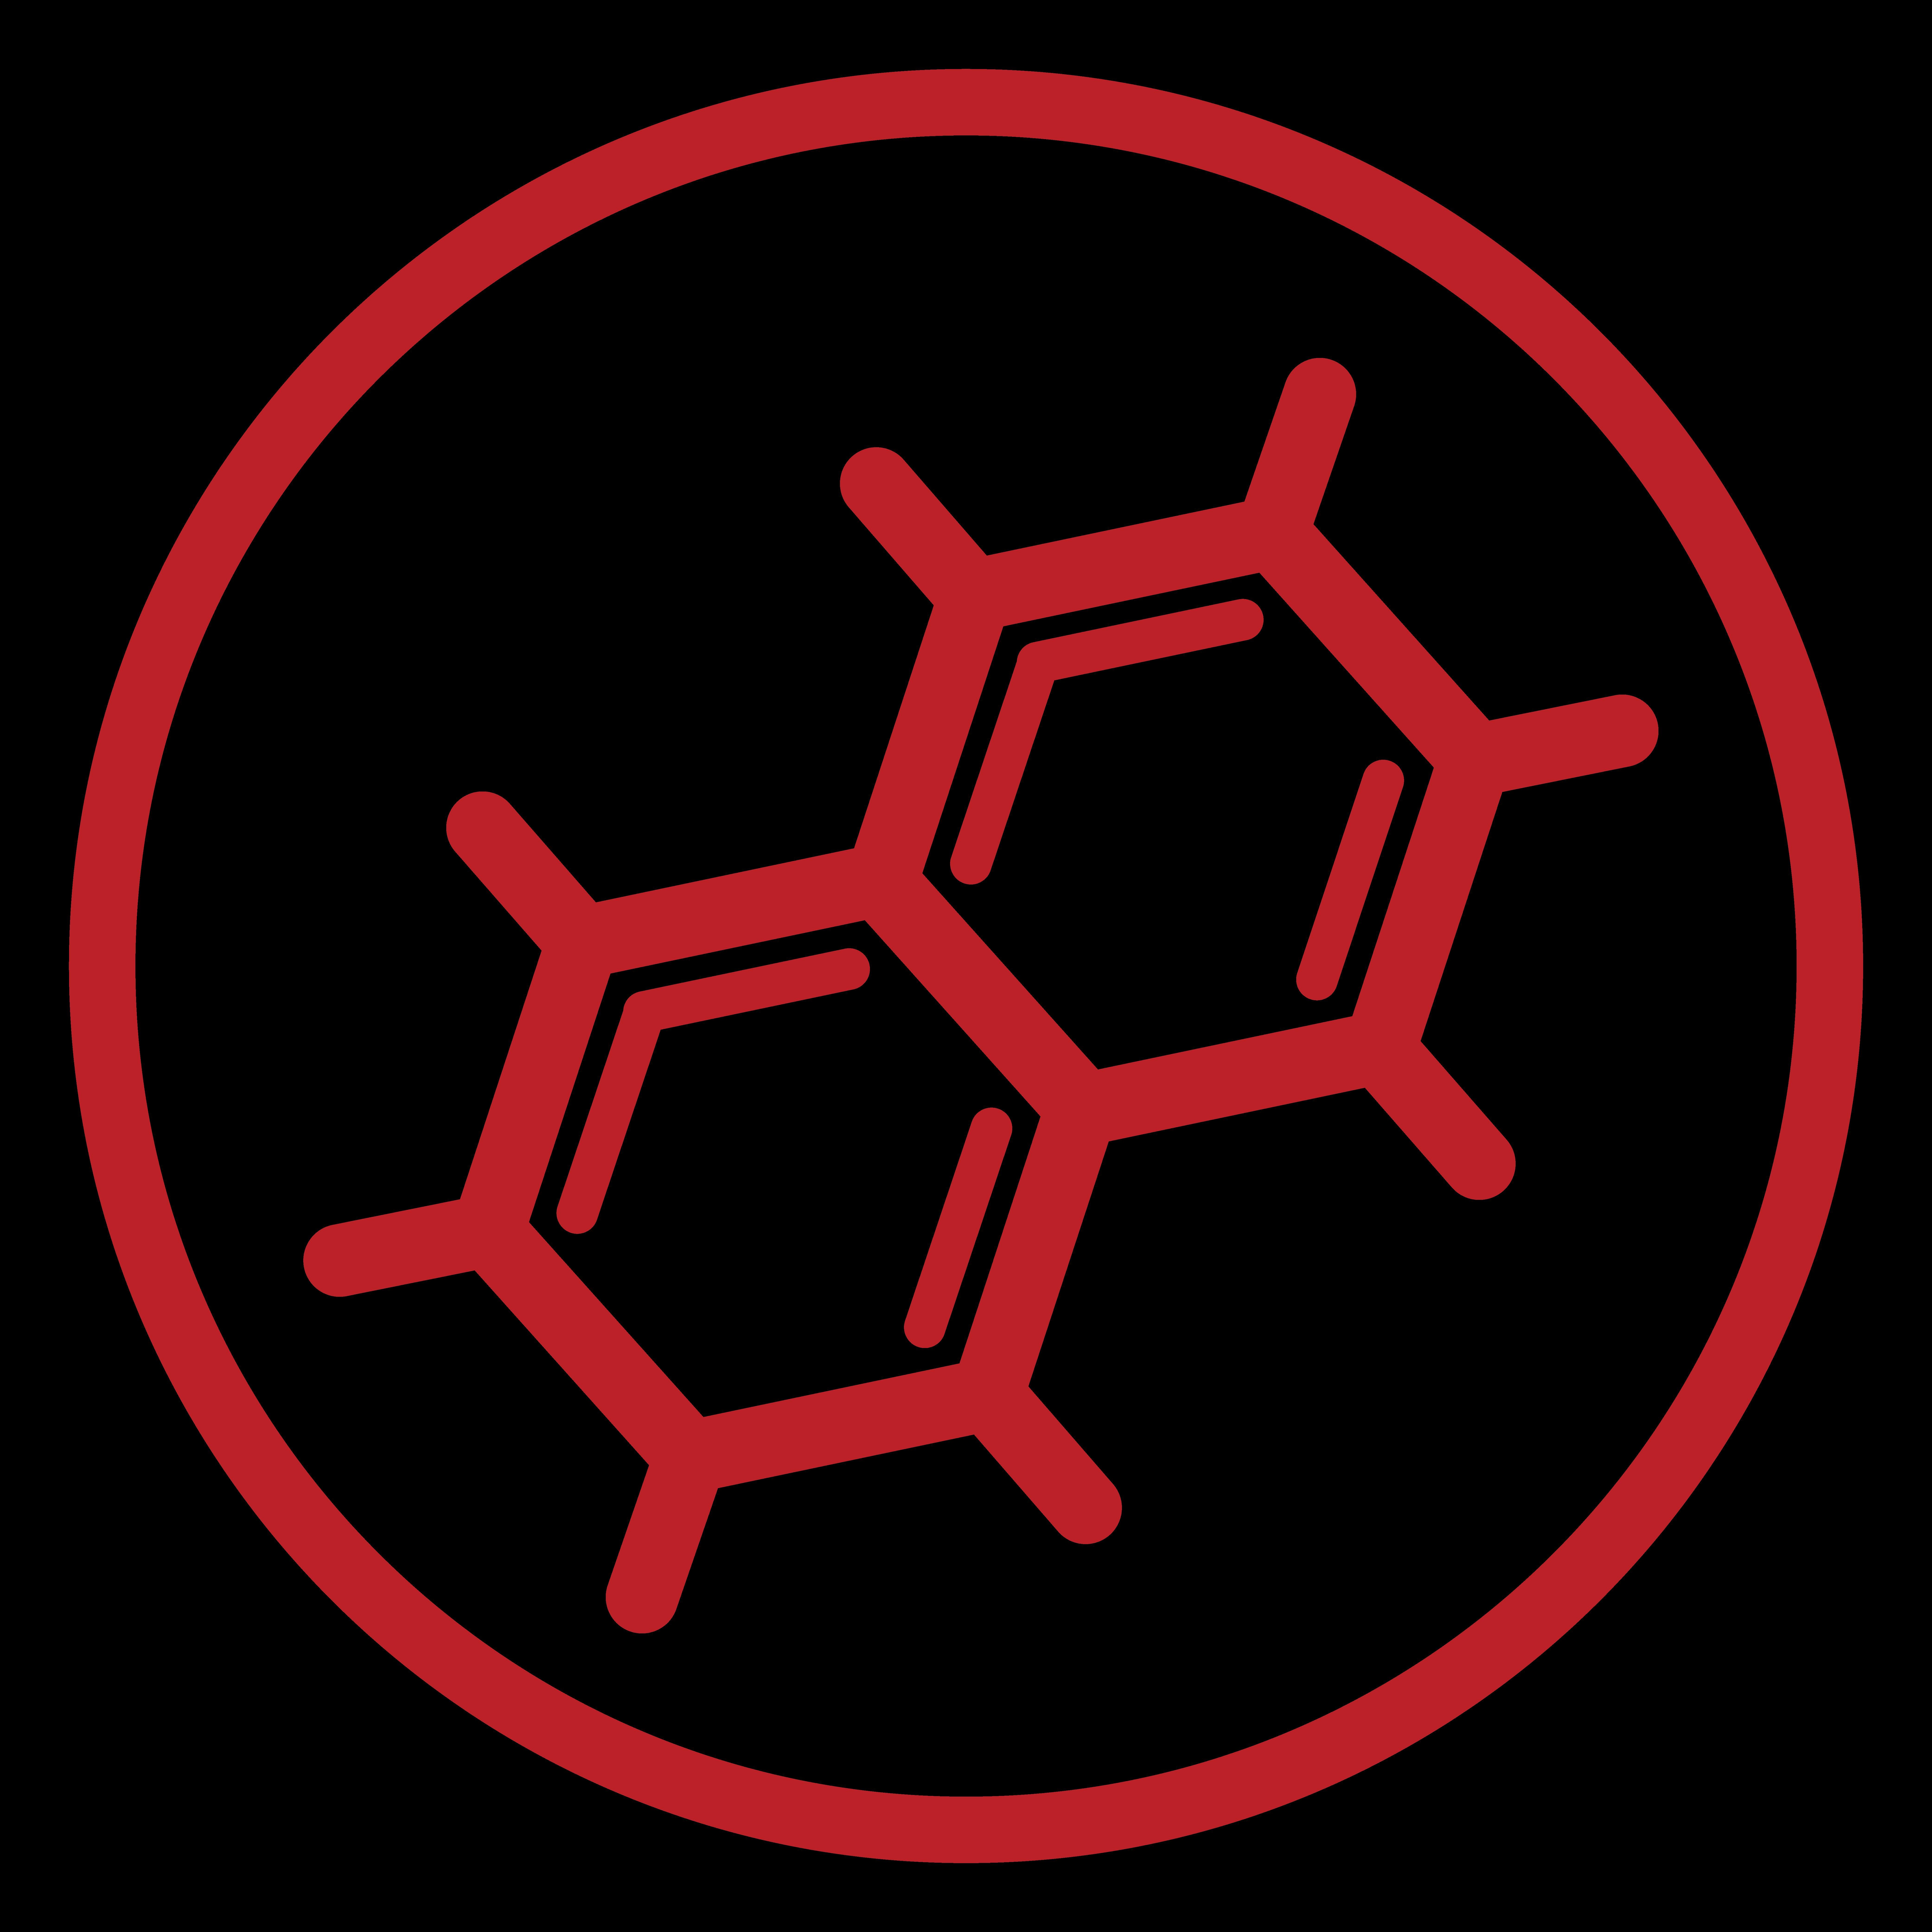 Solvent logo